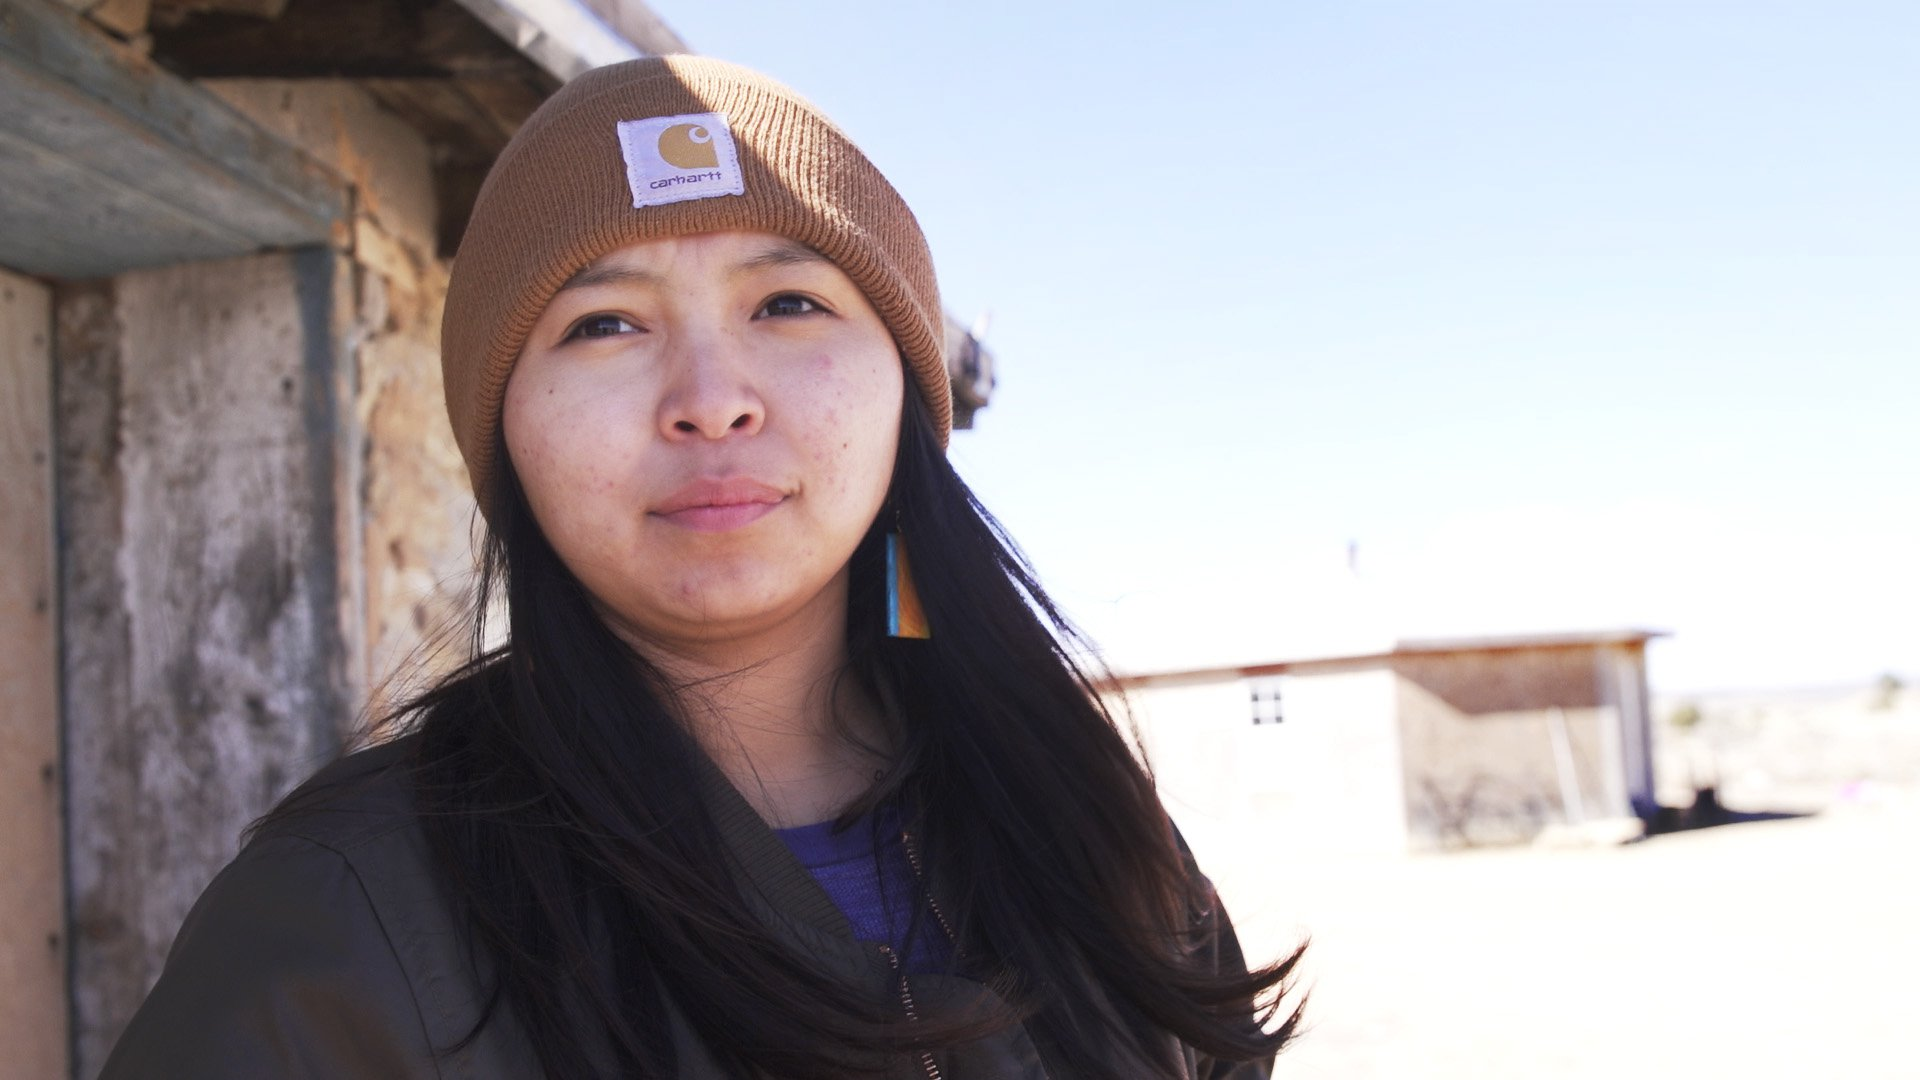 Cheyenne_Portrait.jpg